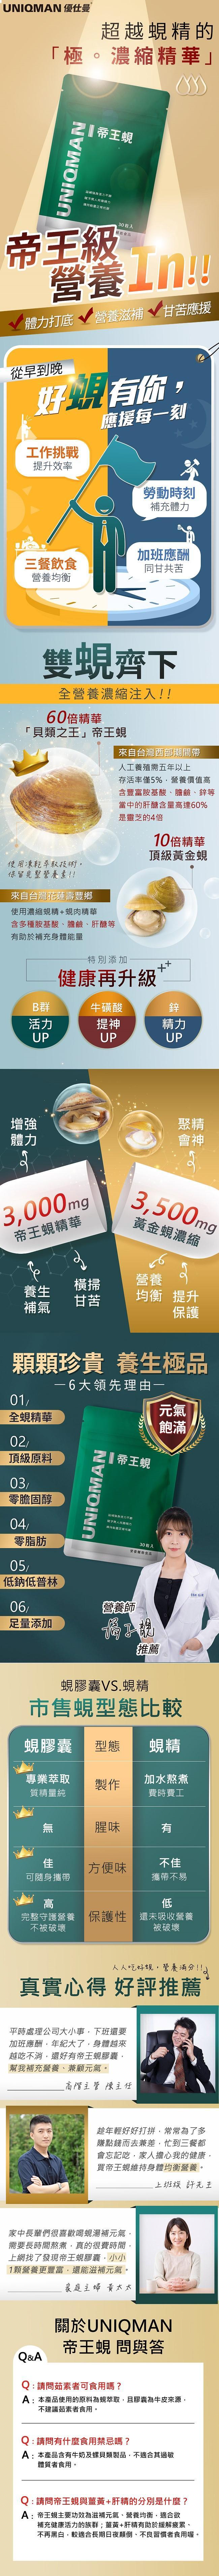 UNIQMAN-帝王蜆膠囊食品(30粒/袋)3袋組產品資訊